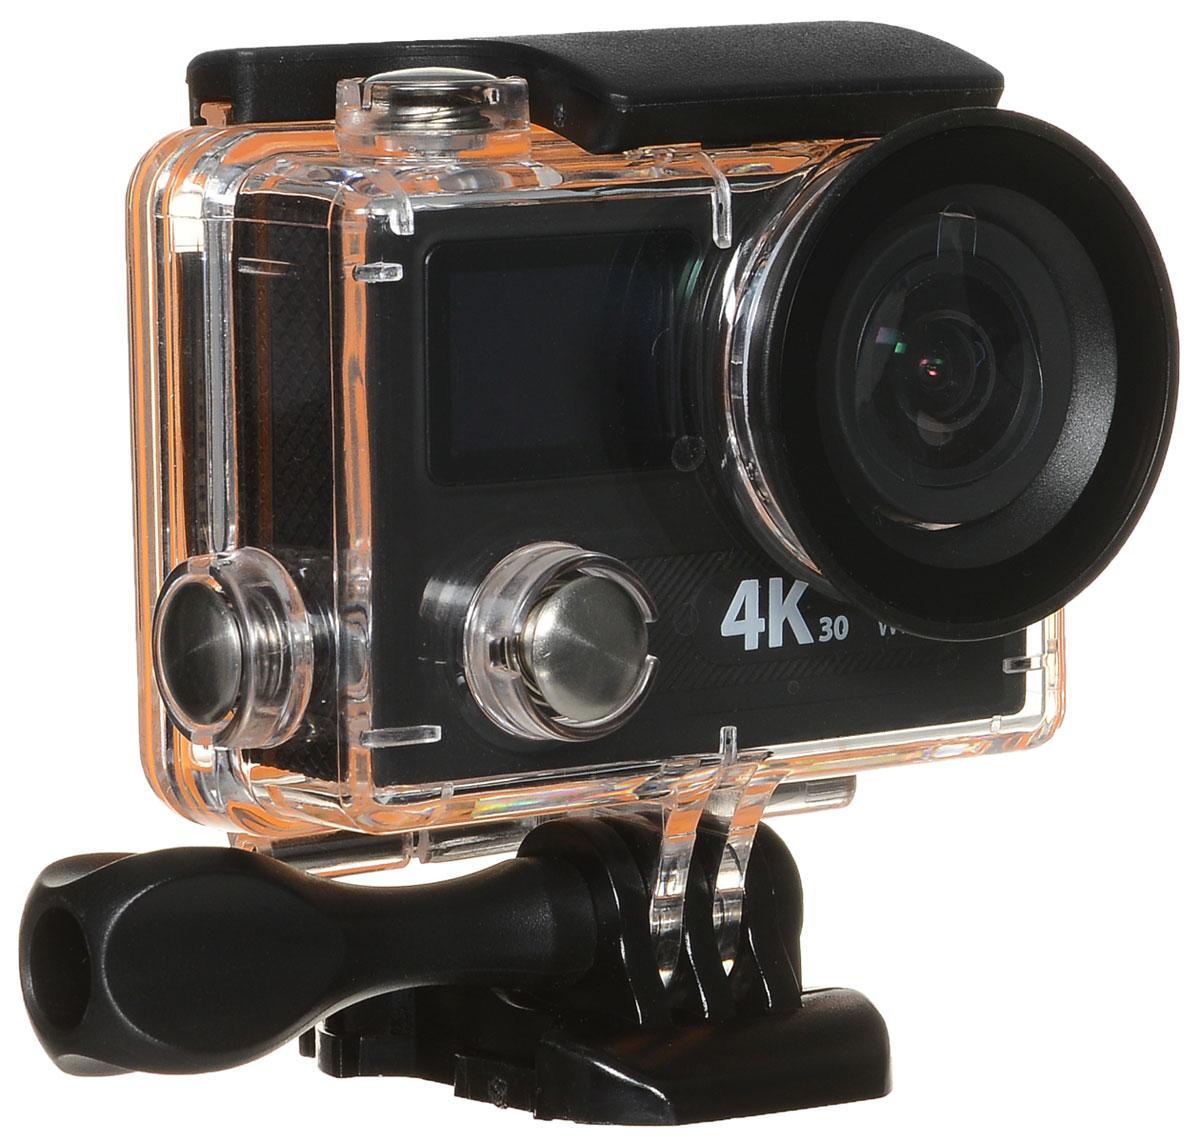 Eken H8 PRO Ultra HD экшн камера, черная ultra hd 4k wifi sport action camera h8r h8 with remote control dual screen 2 lcd waterproof helmet vr360 camcorder dvr